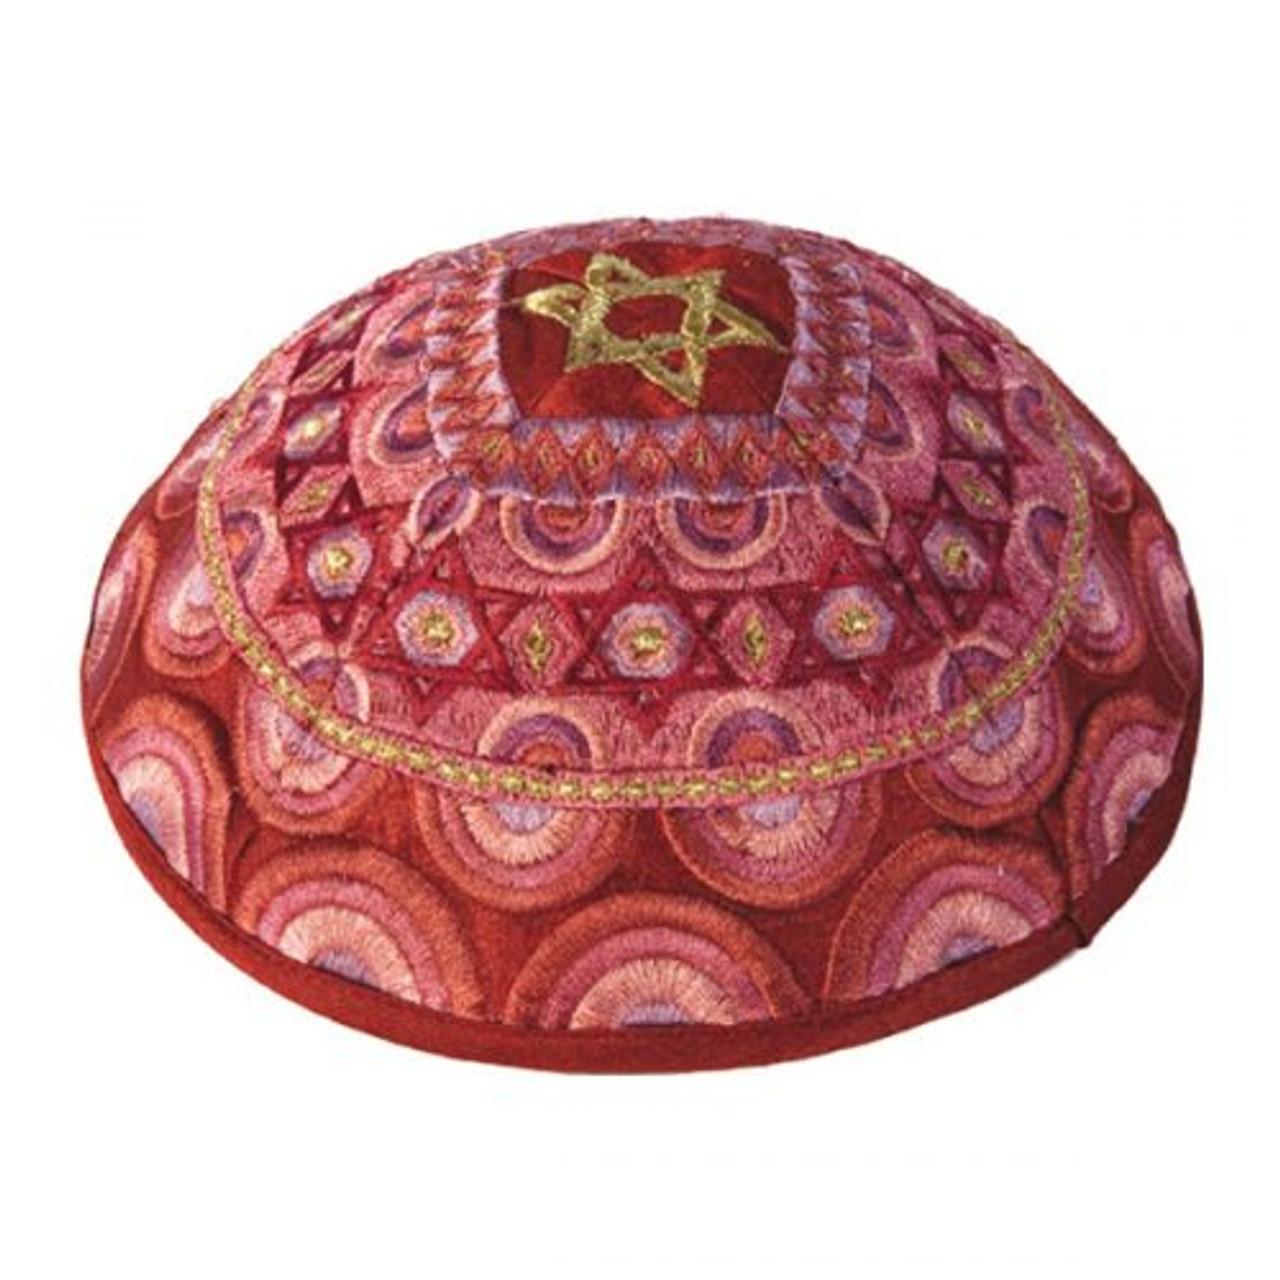 Magen David Red & Gold Embroidered Kippah